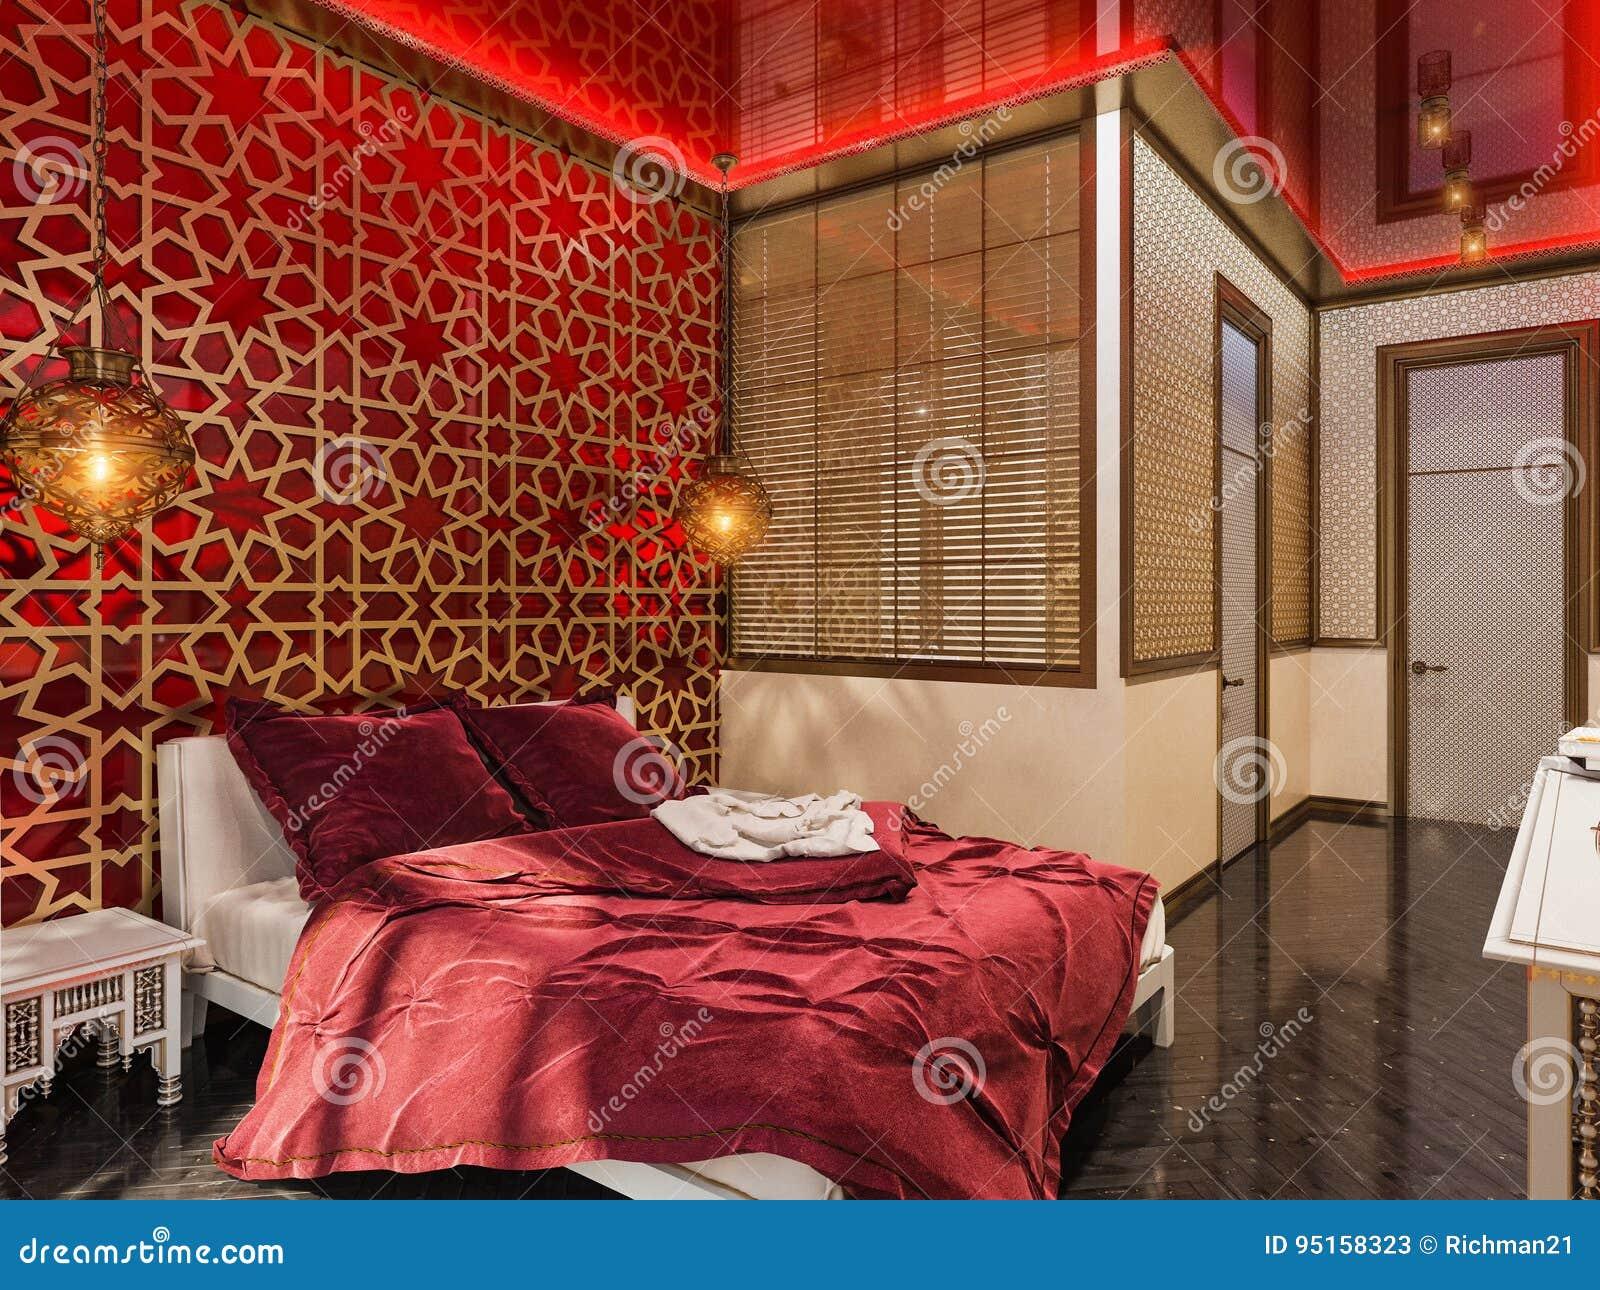 3d render bedroom islamic style interior design stock for Beautiful hotel room design